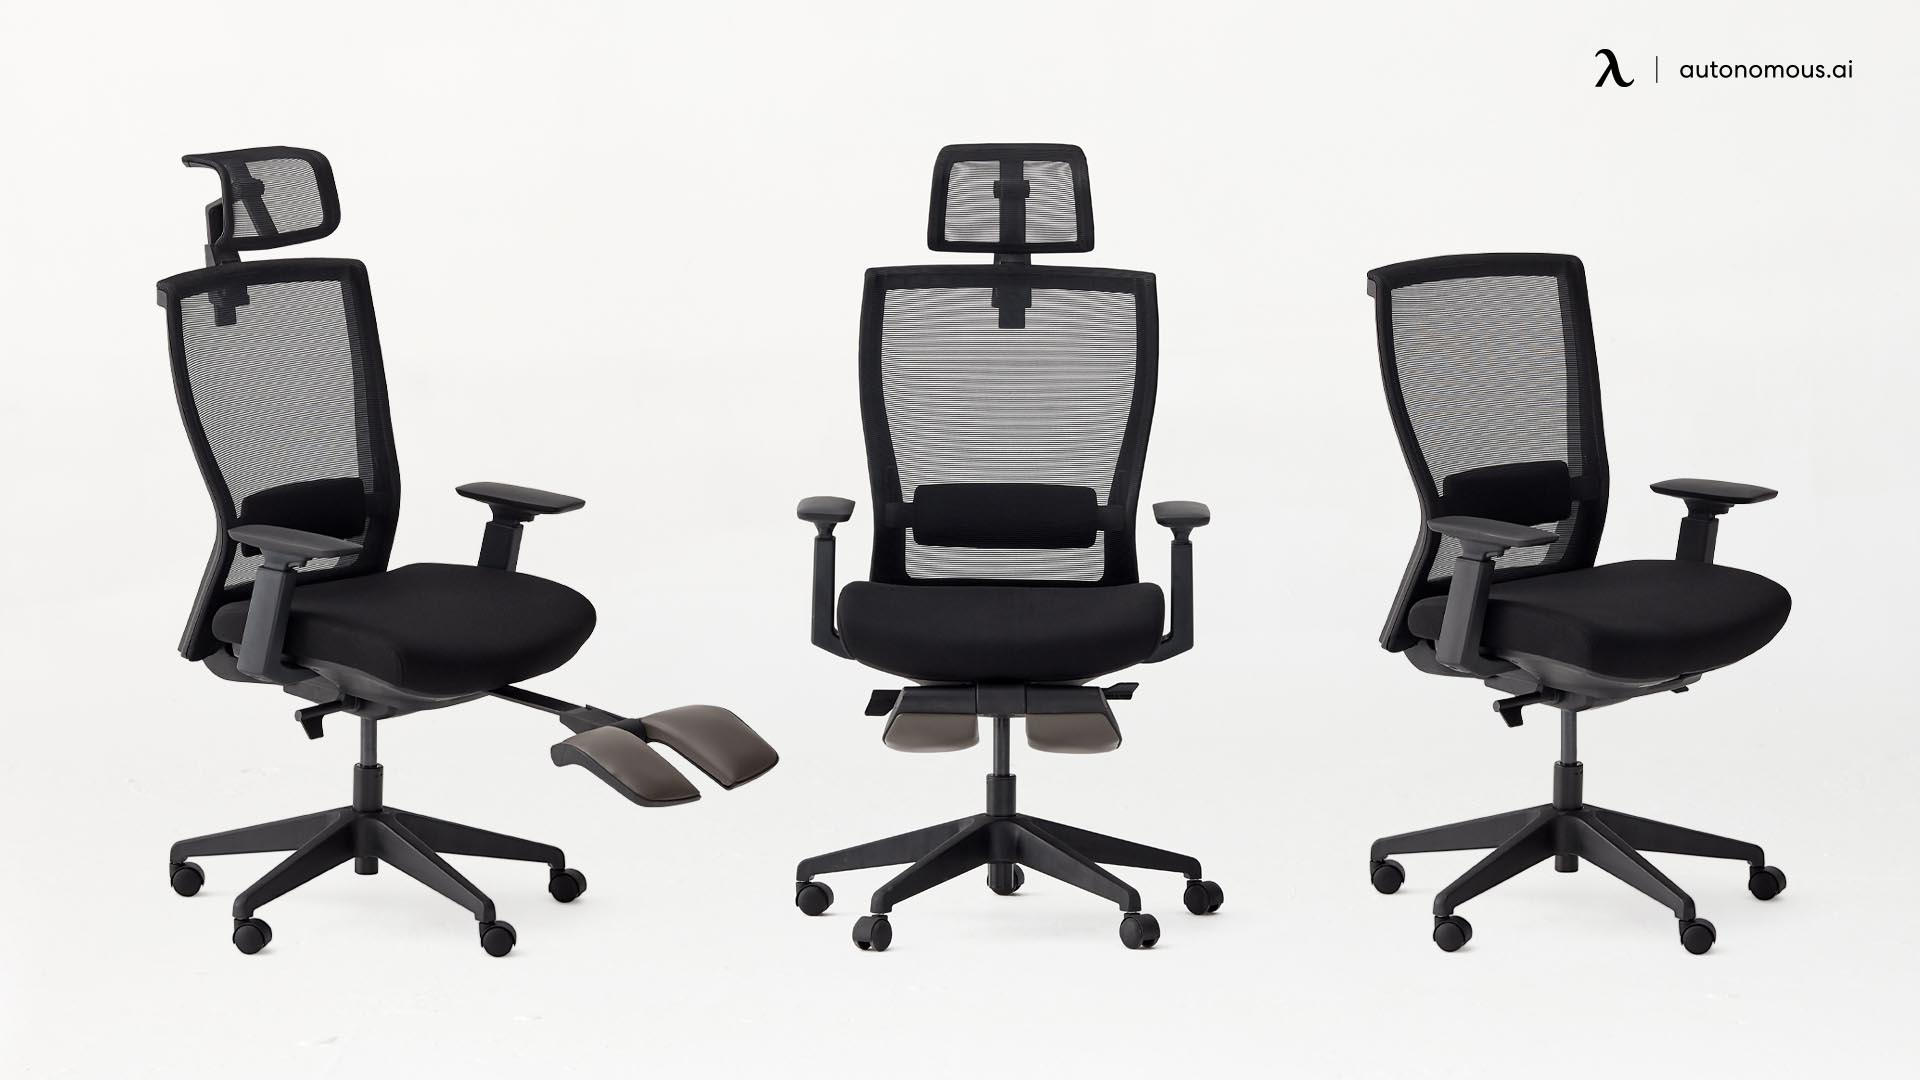 MyoChair - Best executive adjustable reclining chair